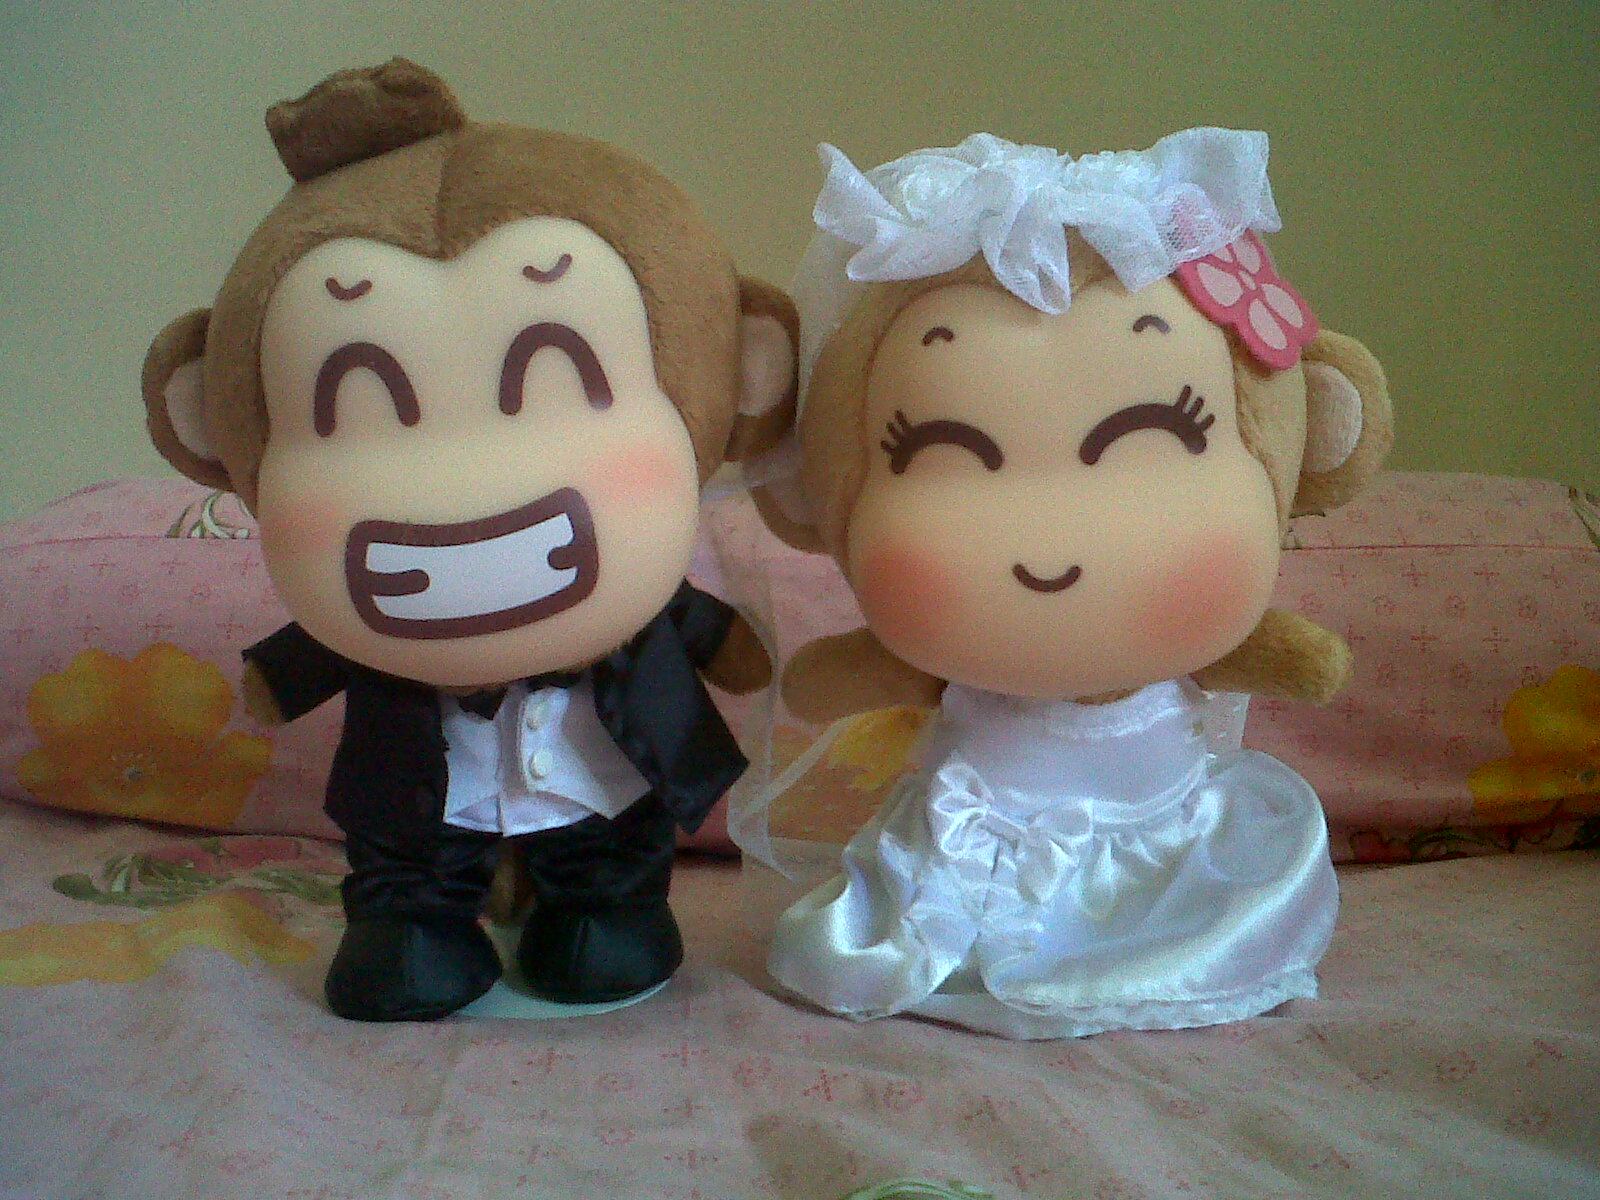 Jual Boneka Yoyo Cici Wedding Couple 25 Cm Original Kota